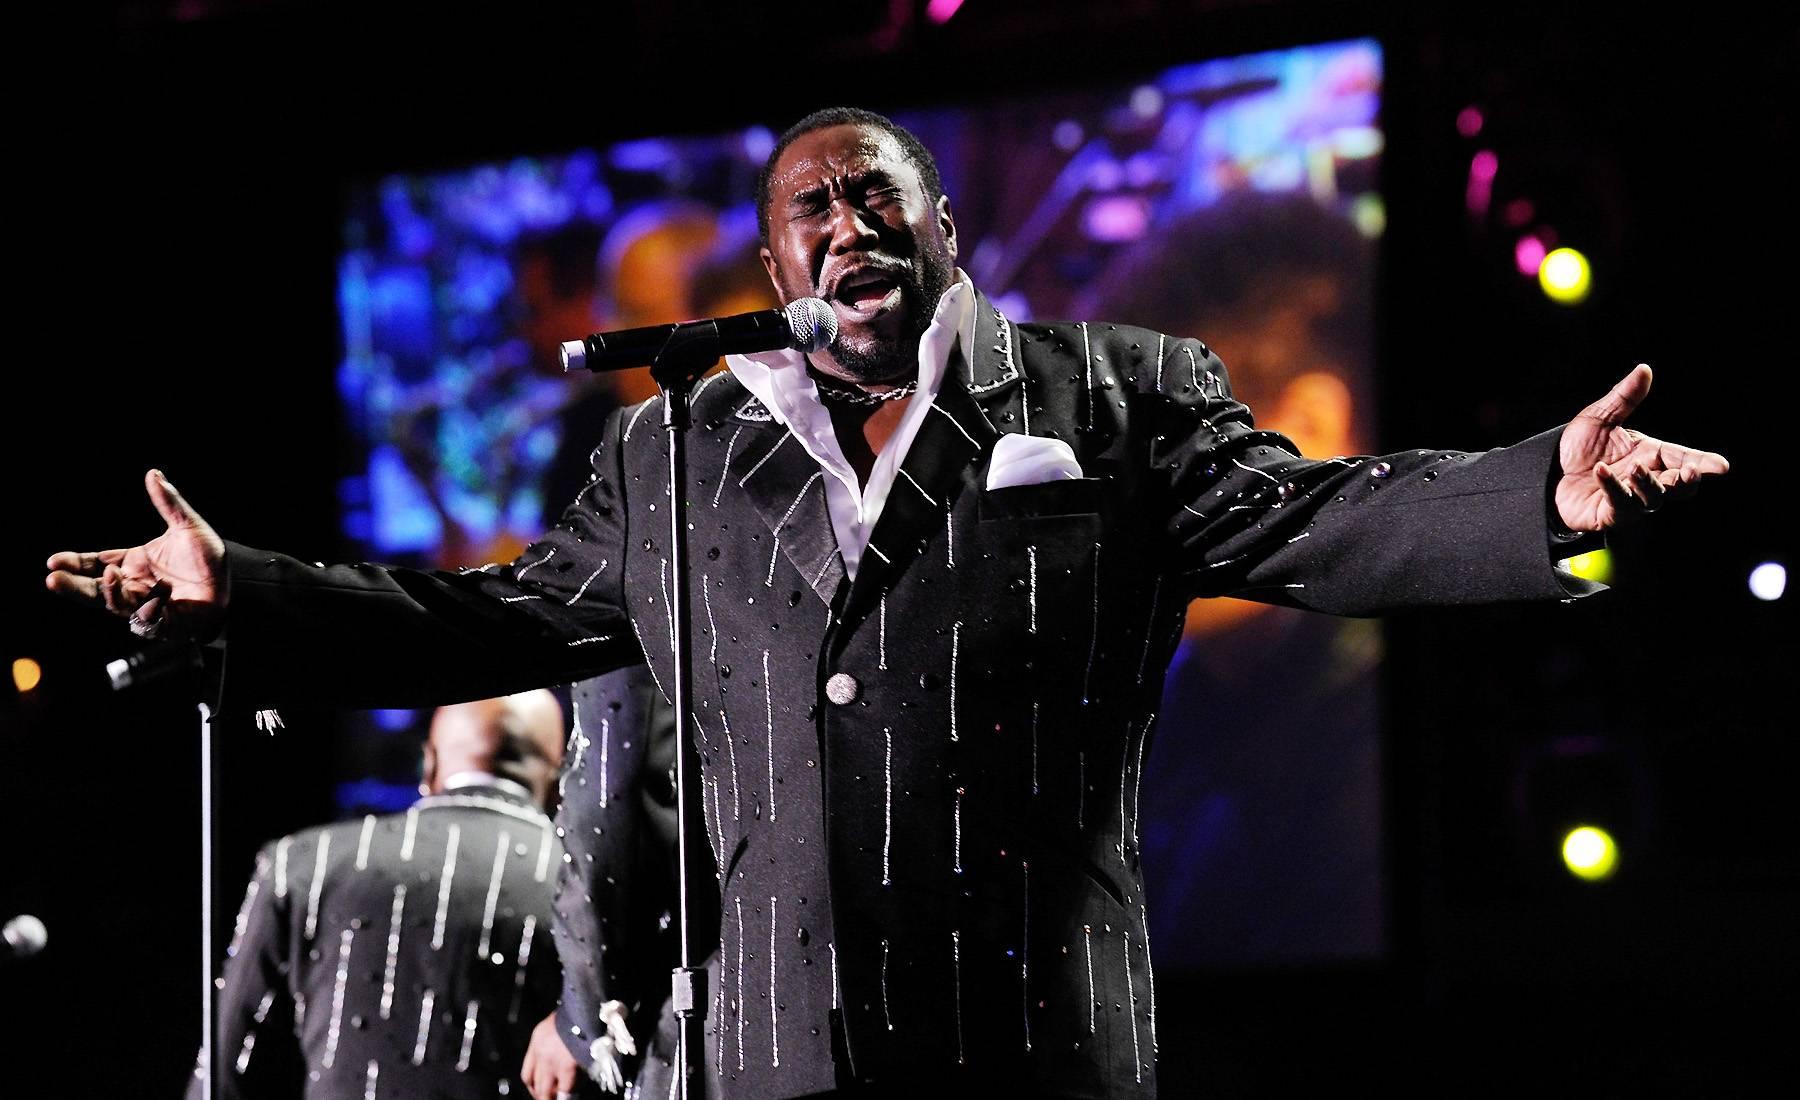 /content/dam/betcom/images/2012/11/Shows/Soul-Train-Awards/110412-shows-sta-eddie-levert-6.jpg